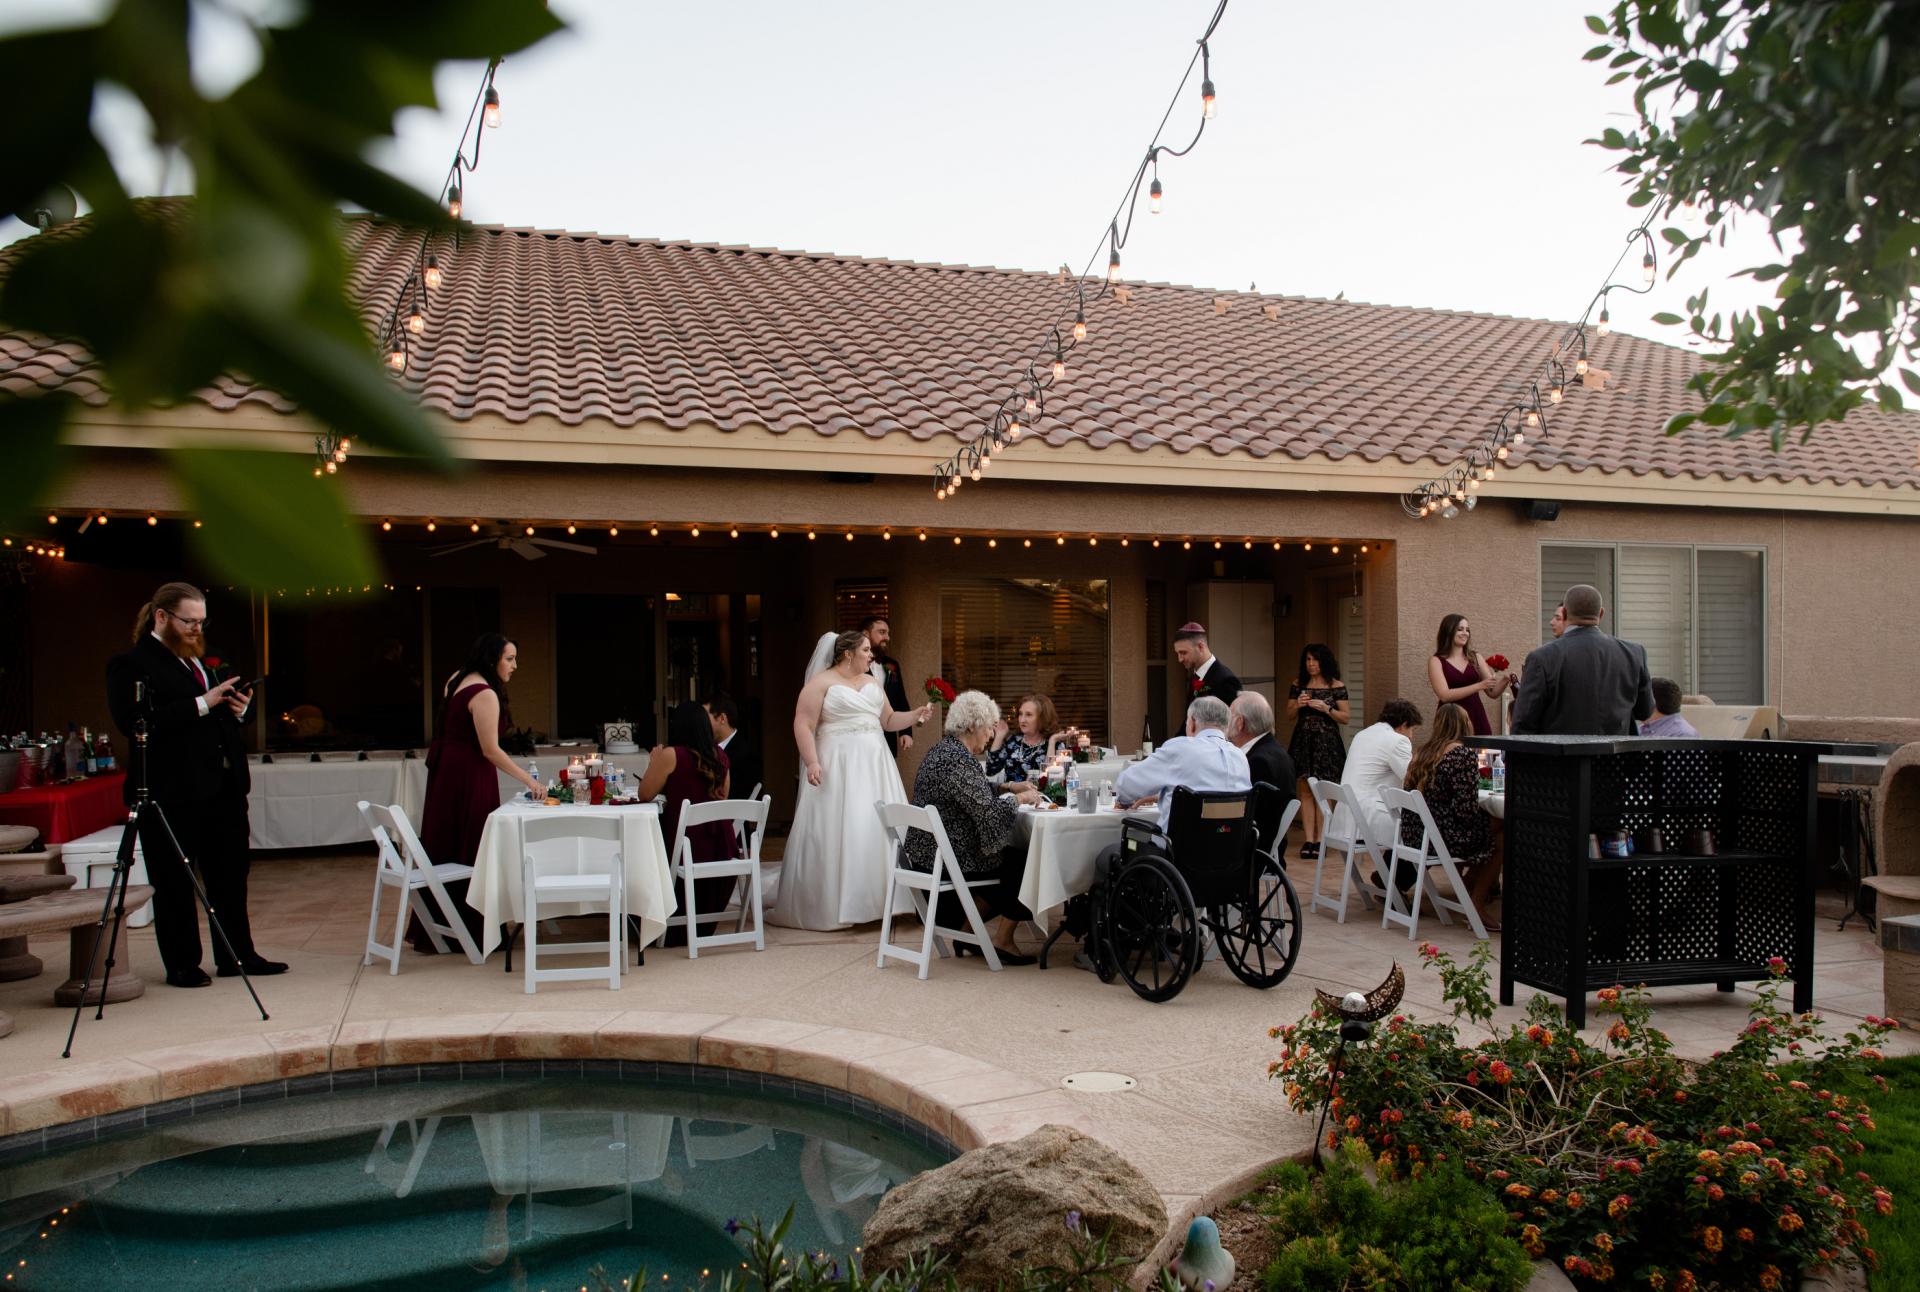 Phoenix Arizona, Poolside Backyard Wedding Picture | The couple spent time transforming their relative's backyard into a romantic and idyllic wedding reception venue